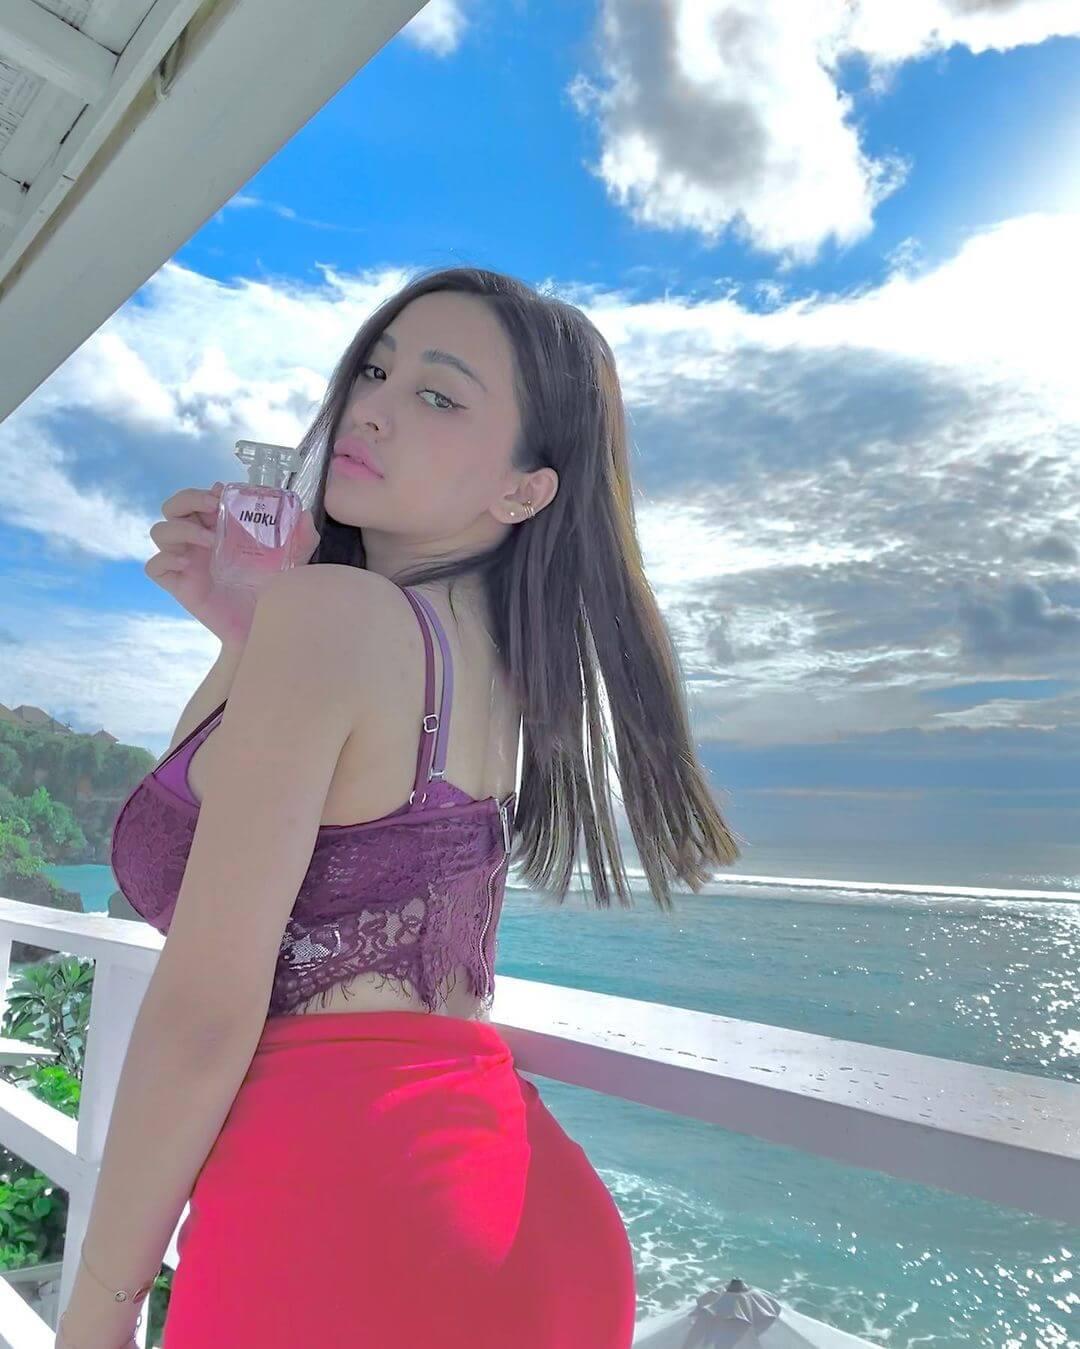 Indonesian Singer Cupi Cupita In Red Skirt